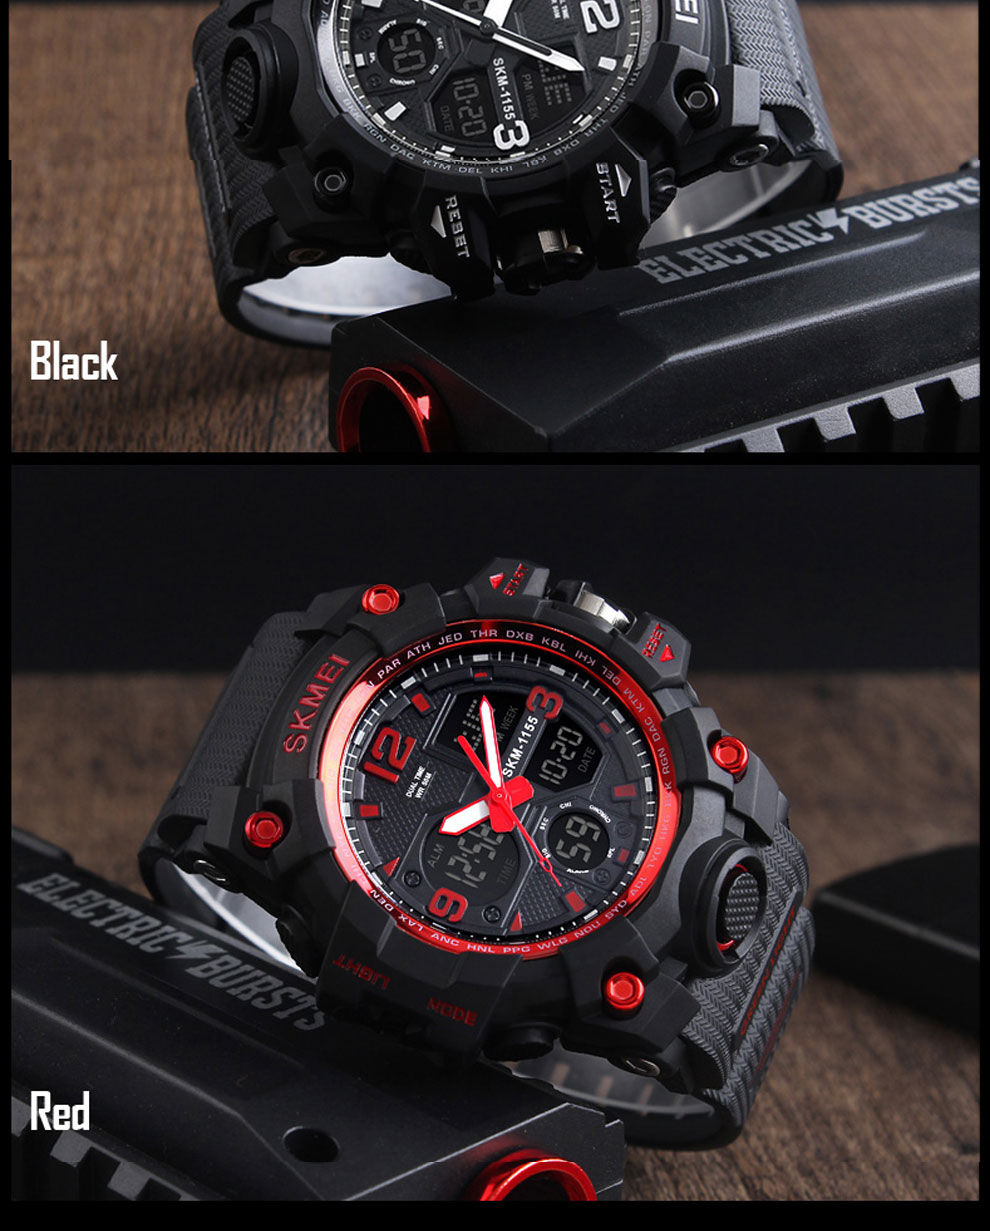 HTB1 eBtRwHqK1RjSZFPq6AwapXa7 SKMEI Brand Luxury Military Sports Watches Men Quartz Analog LED Digital Clock Man Waterproof Dual Display Wristwatches Relogio